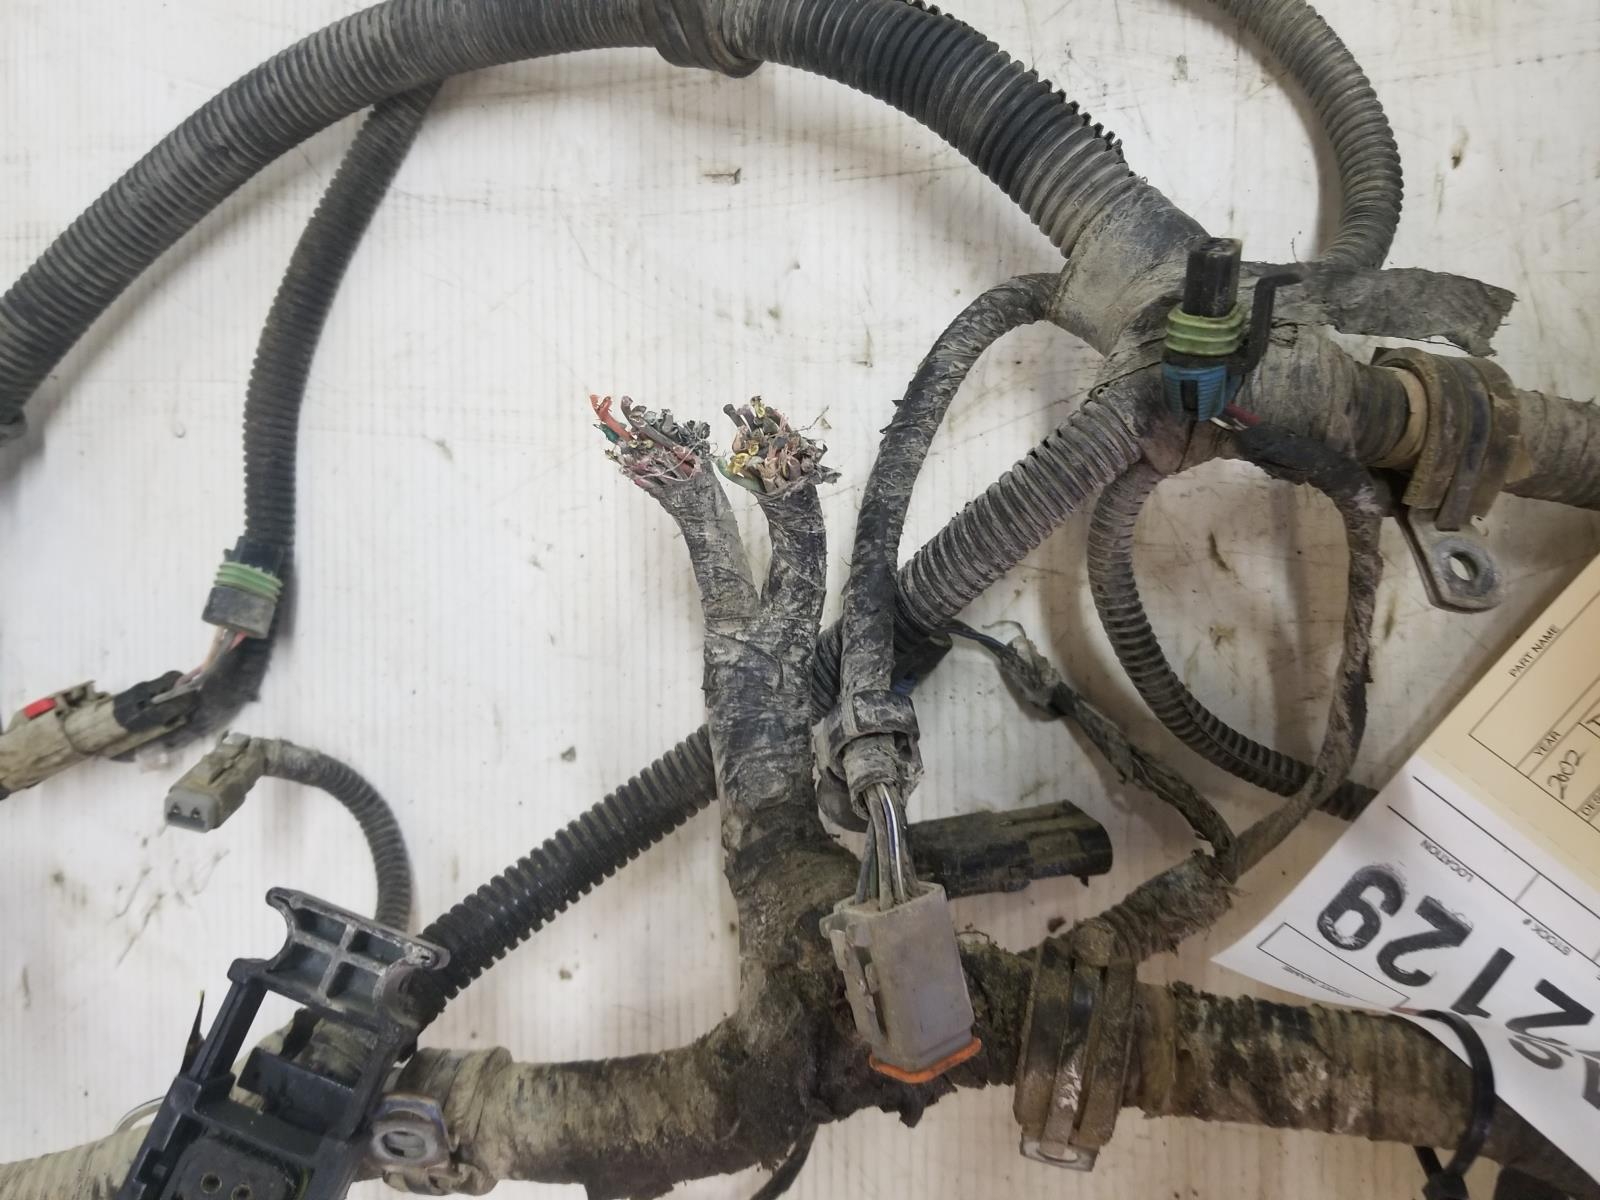 2002 dodge ram 2500 3500 cummins engine wiring harness tag. Black Bedroom Furniture Sets. Home Design Ideas